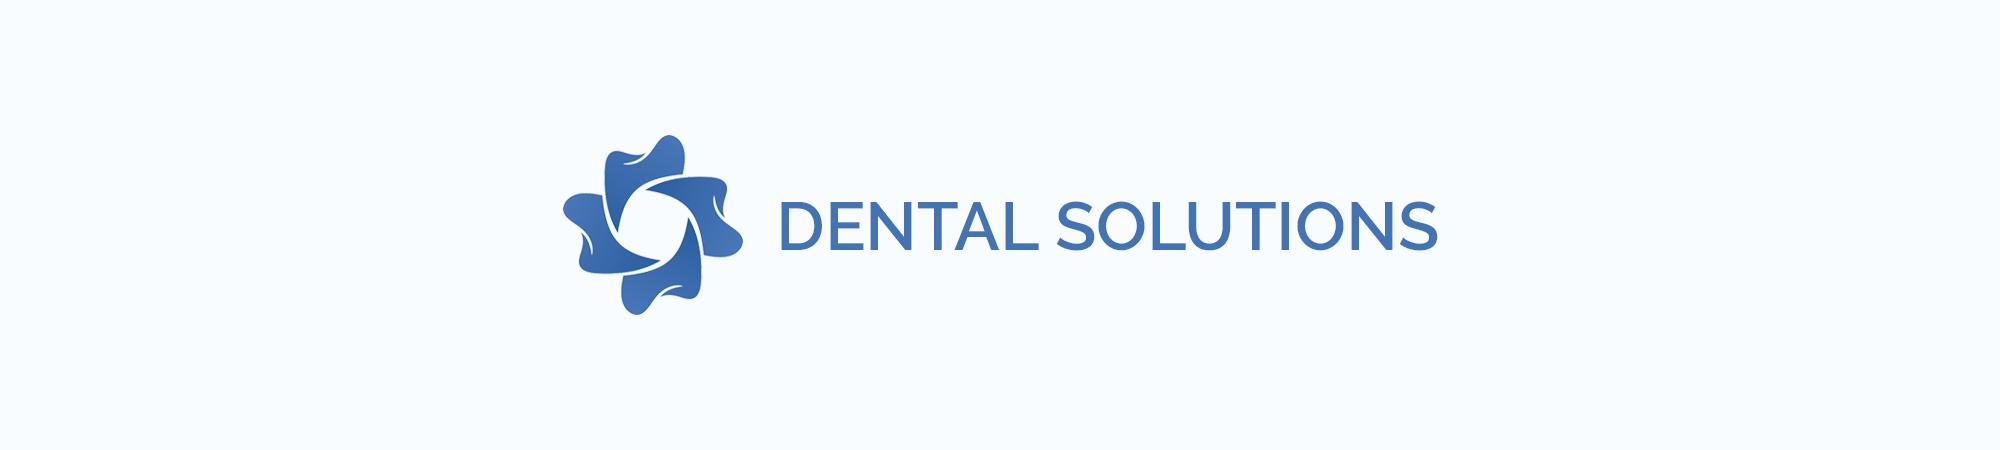 Dent System